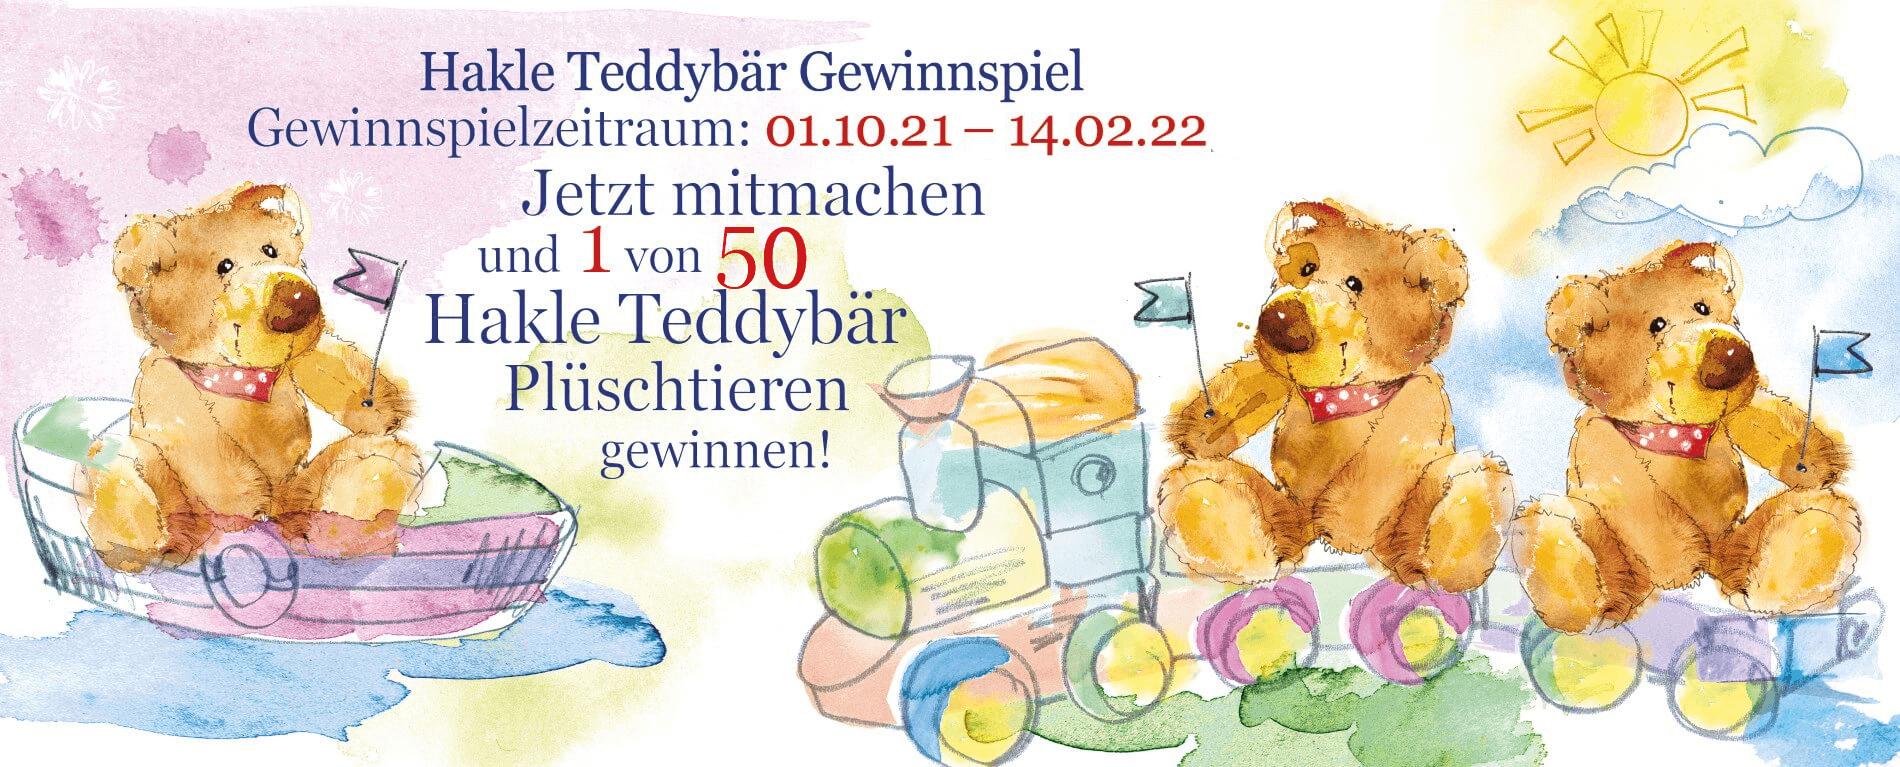 Teddybär_Gewinnspiel_Banner_2